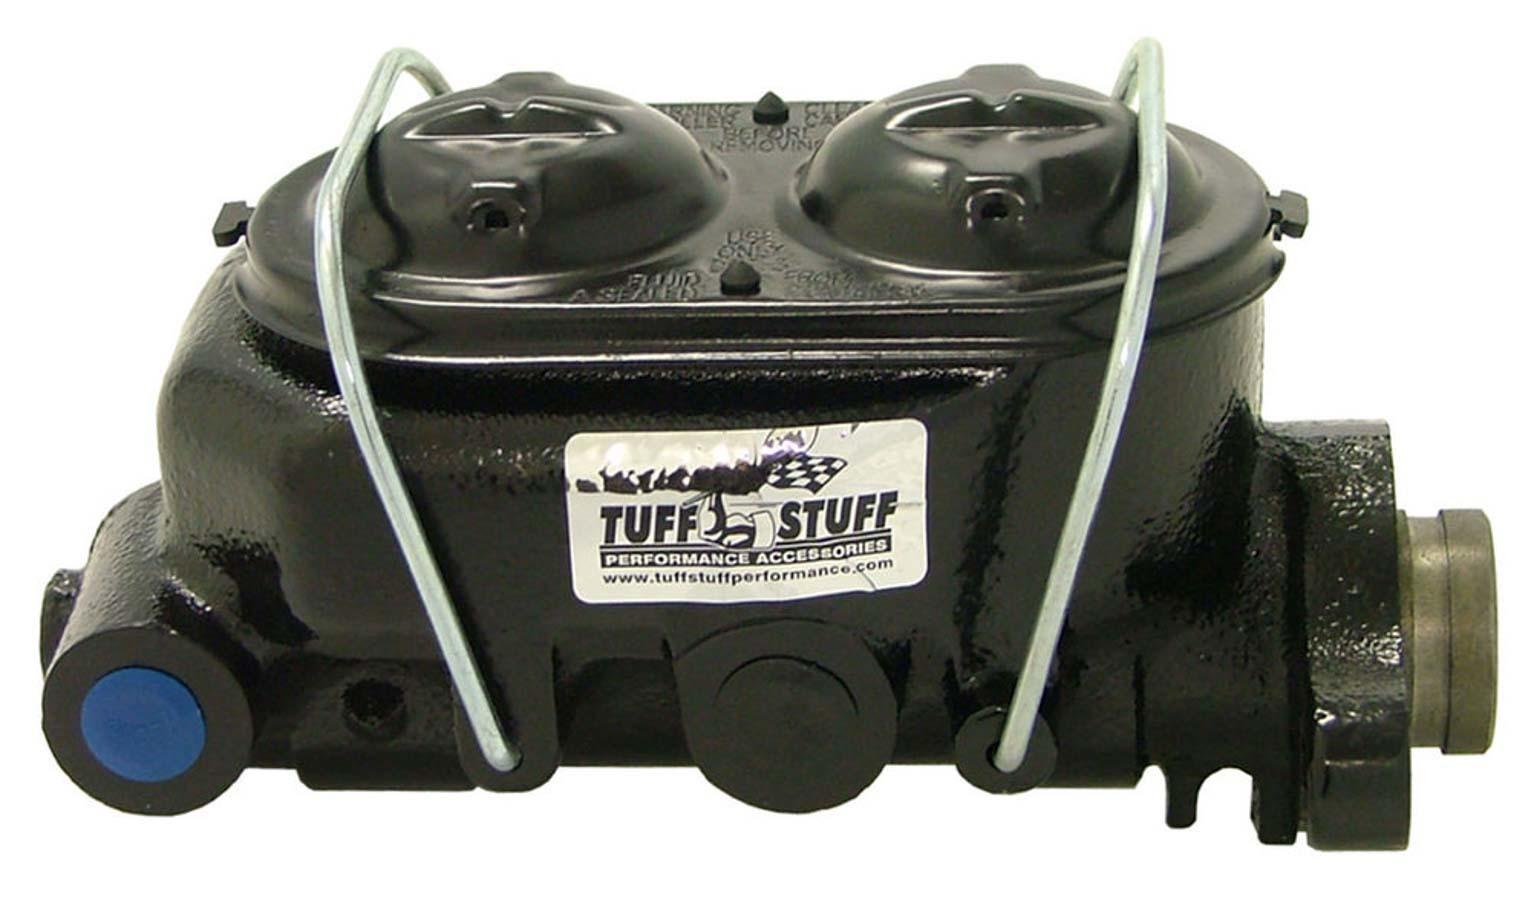 Tuff-stuff Master Cylinder 1in Bore Black